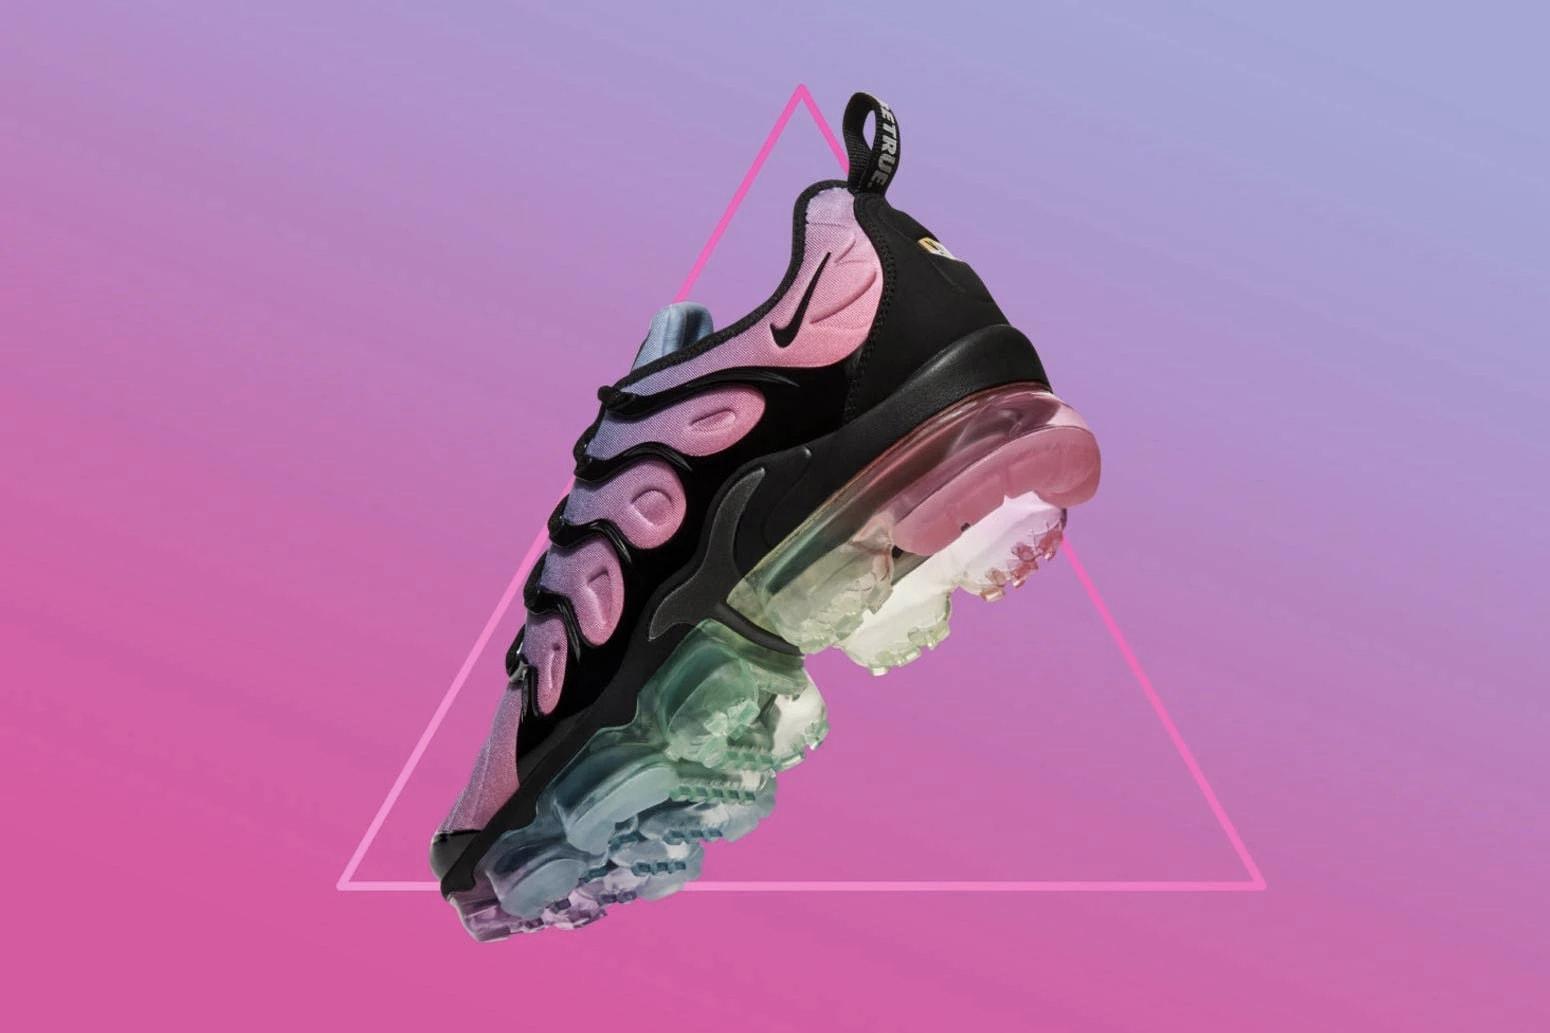 new product 1a388 7c2ae Virgil Abloh x Nike Air Jordan 1 UNC Yeezy 500 Nike BETRUE Pride 2018 Boost  Crayola